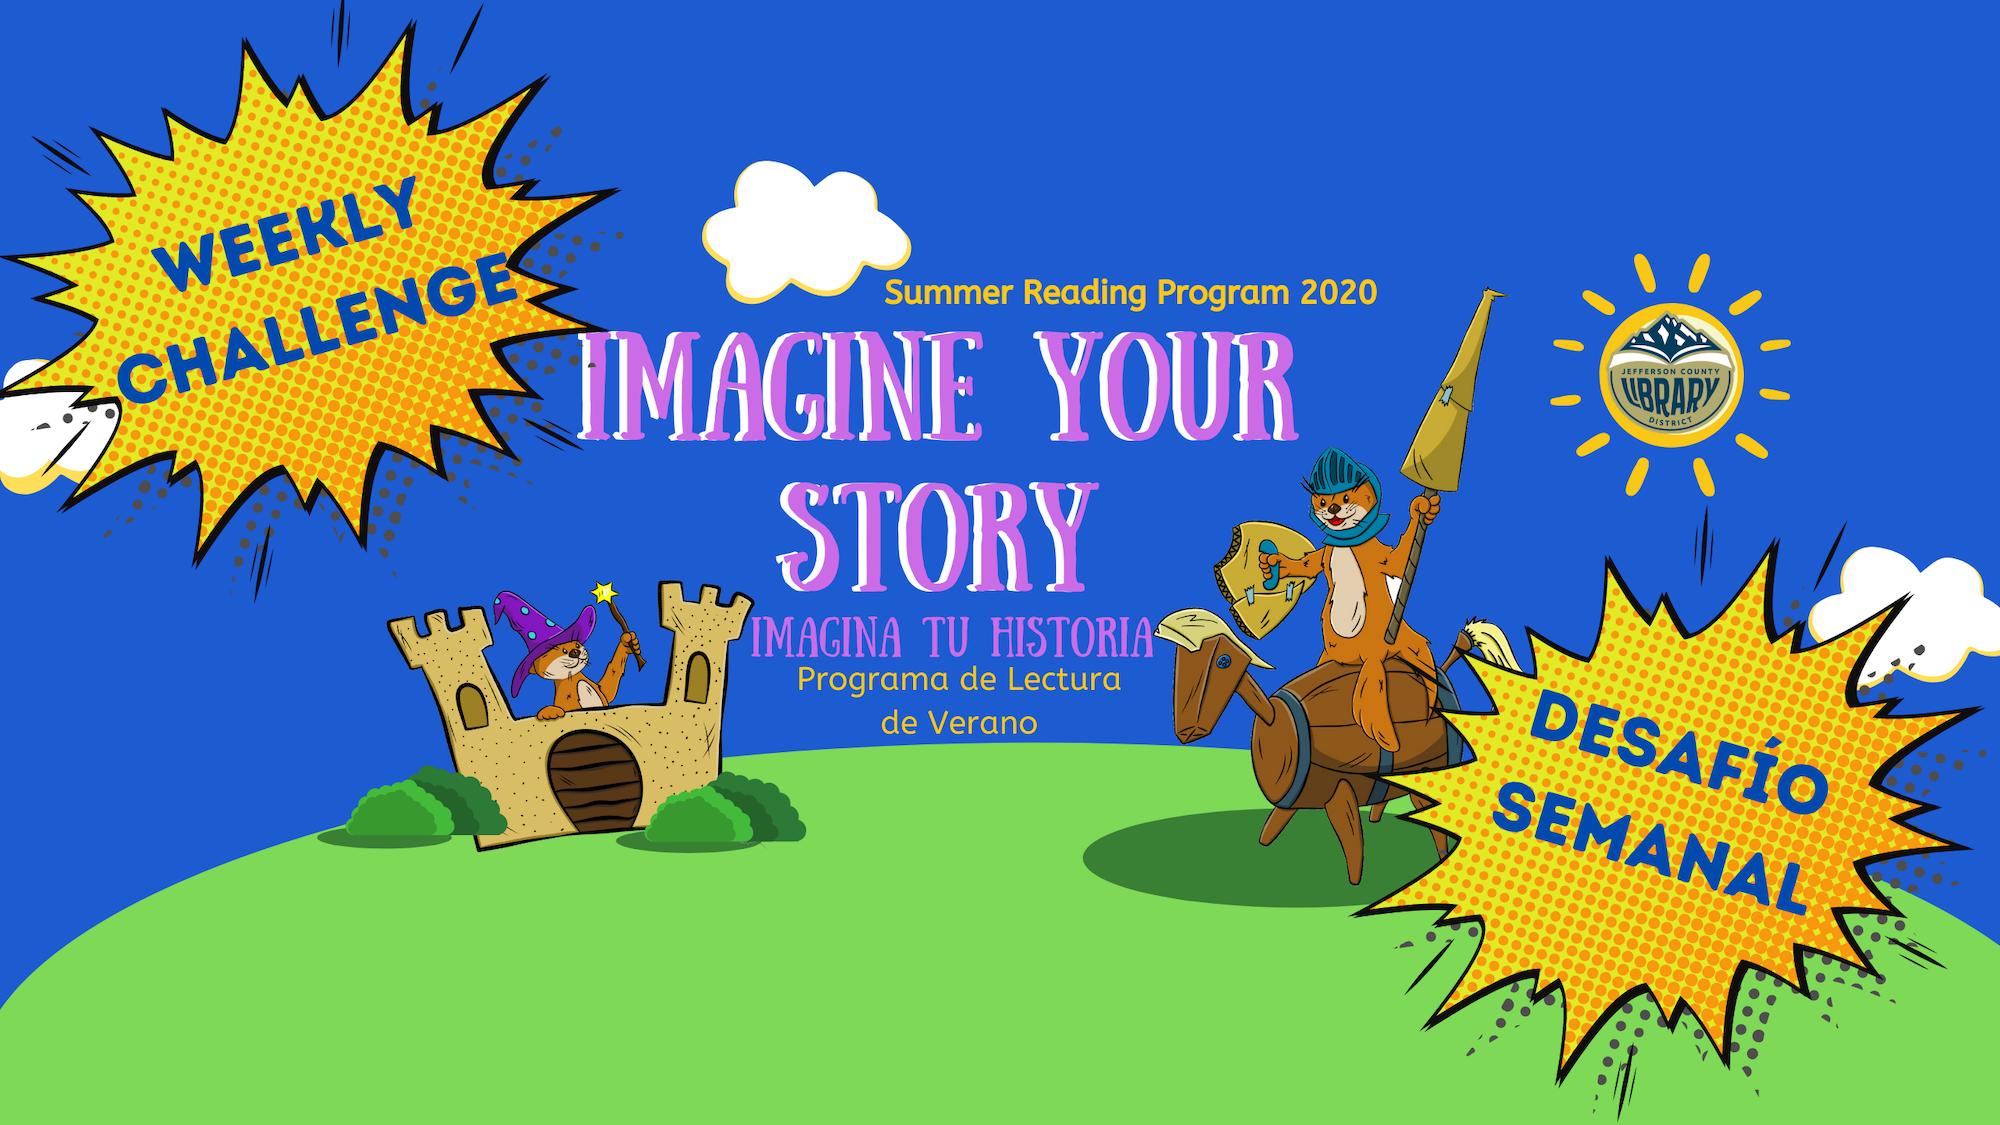 Banner for Summer Reading Program Weekly Challenge